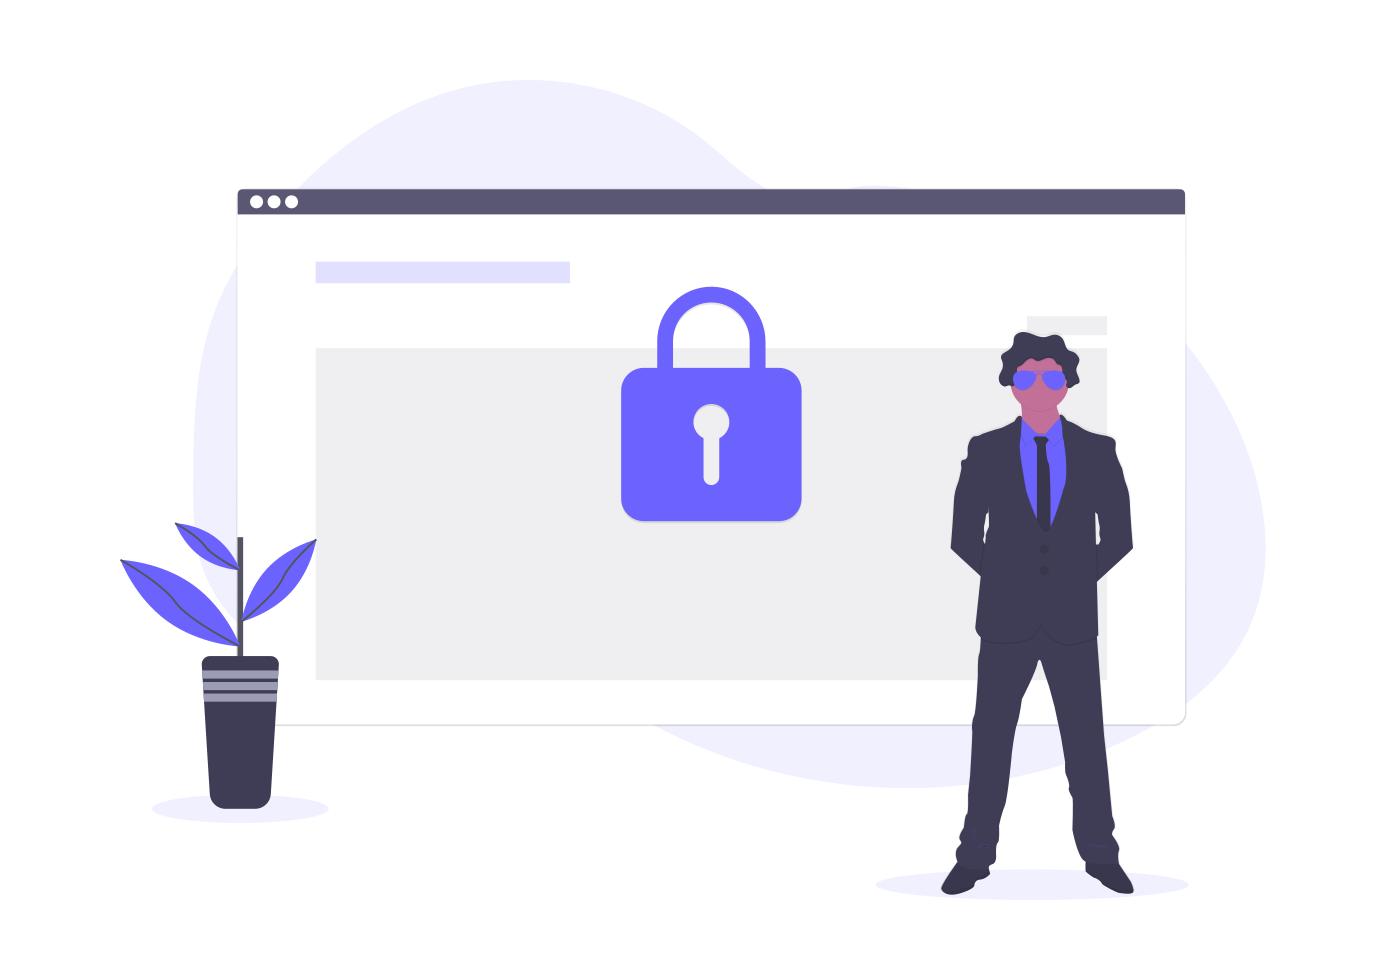 【WAF設定】Webサイトのセキュリティ強化「エックスサーバー」